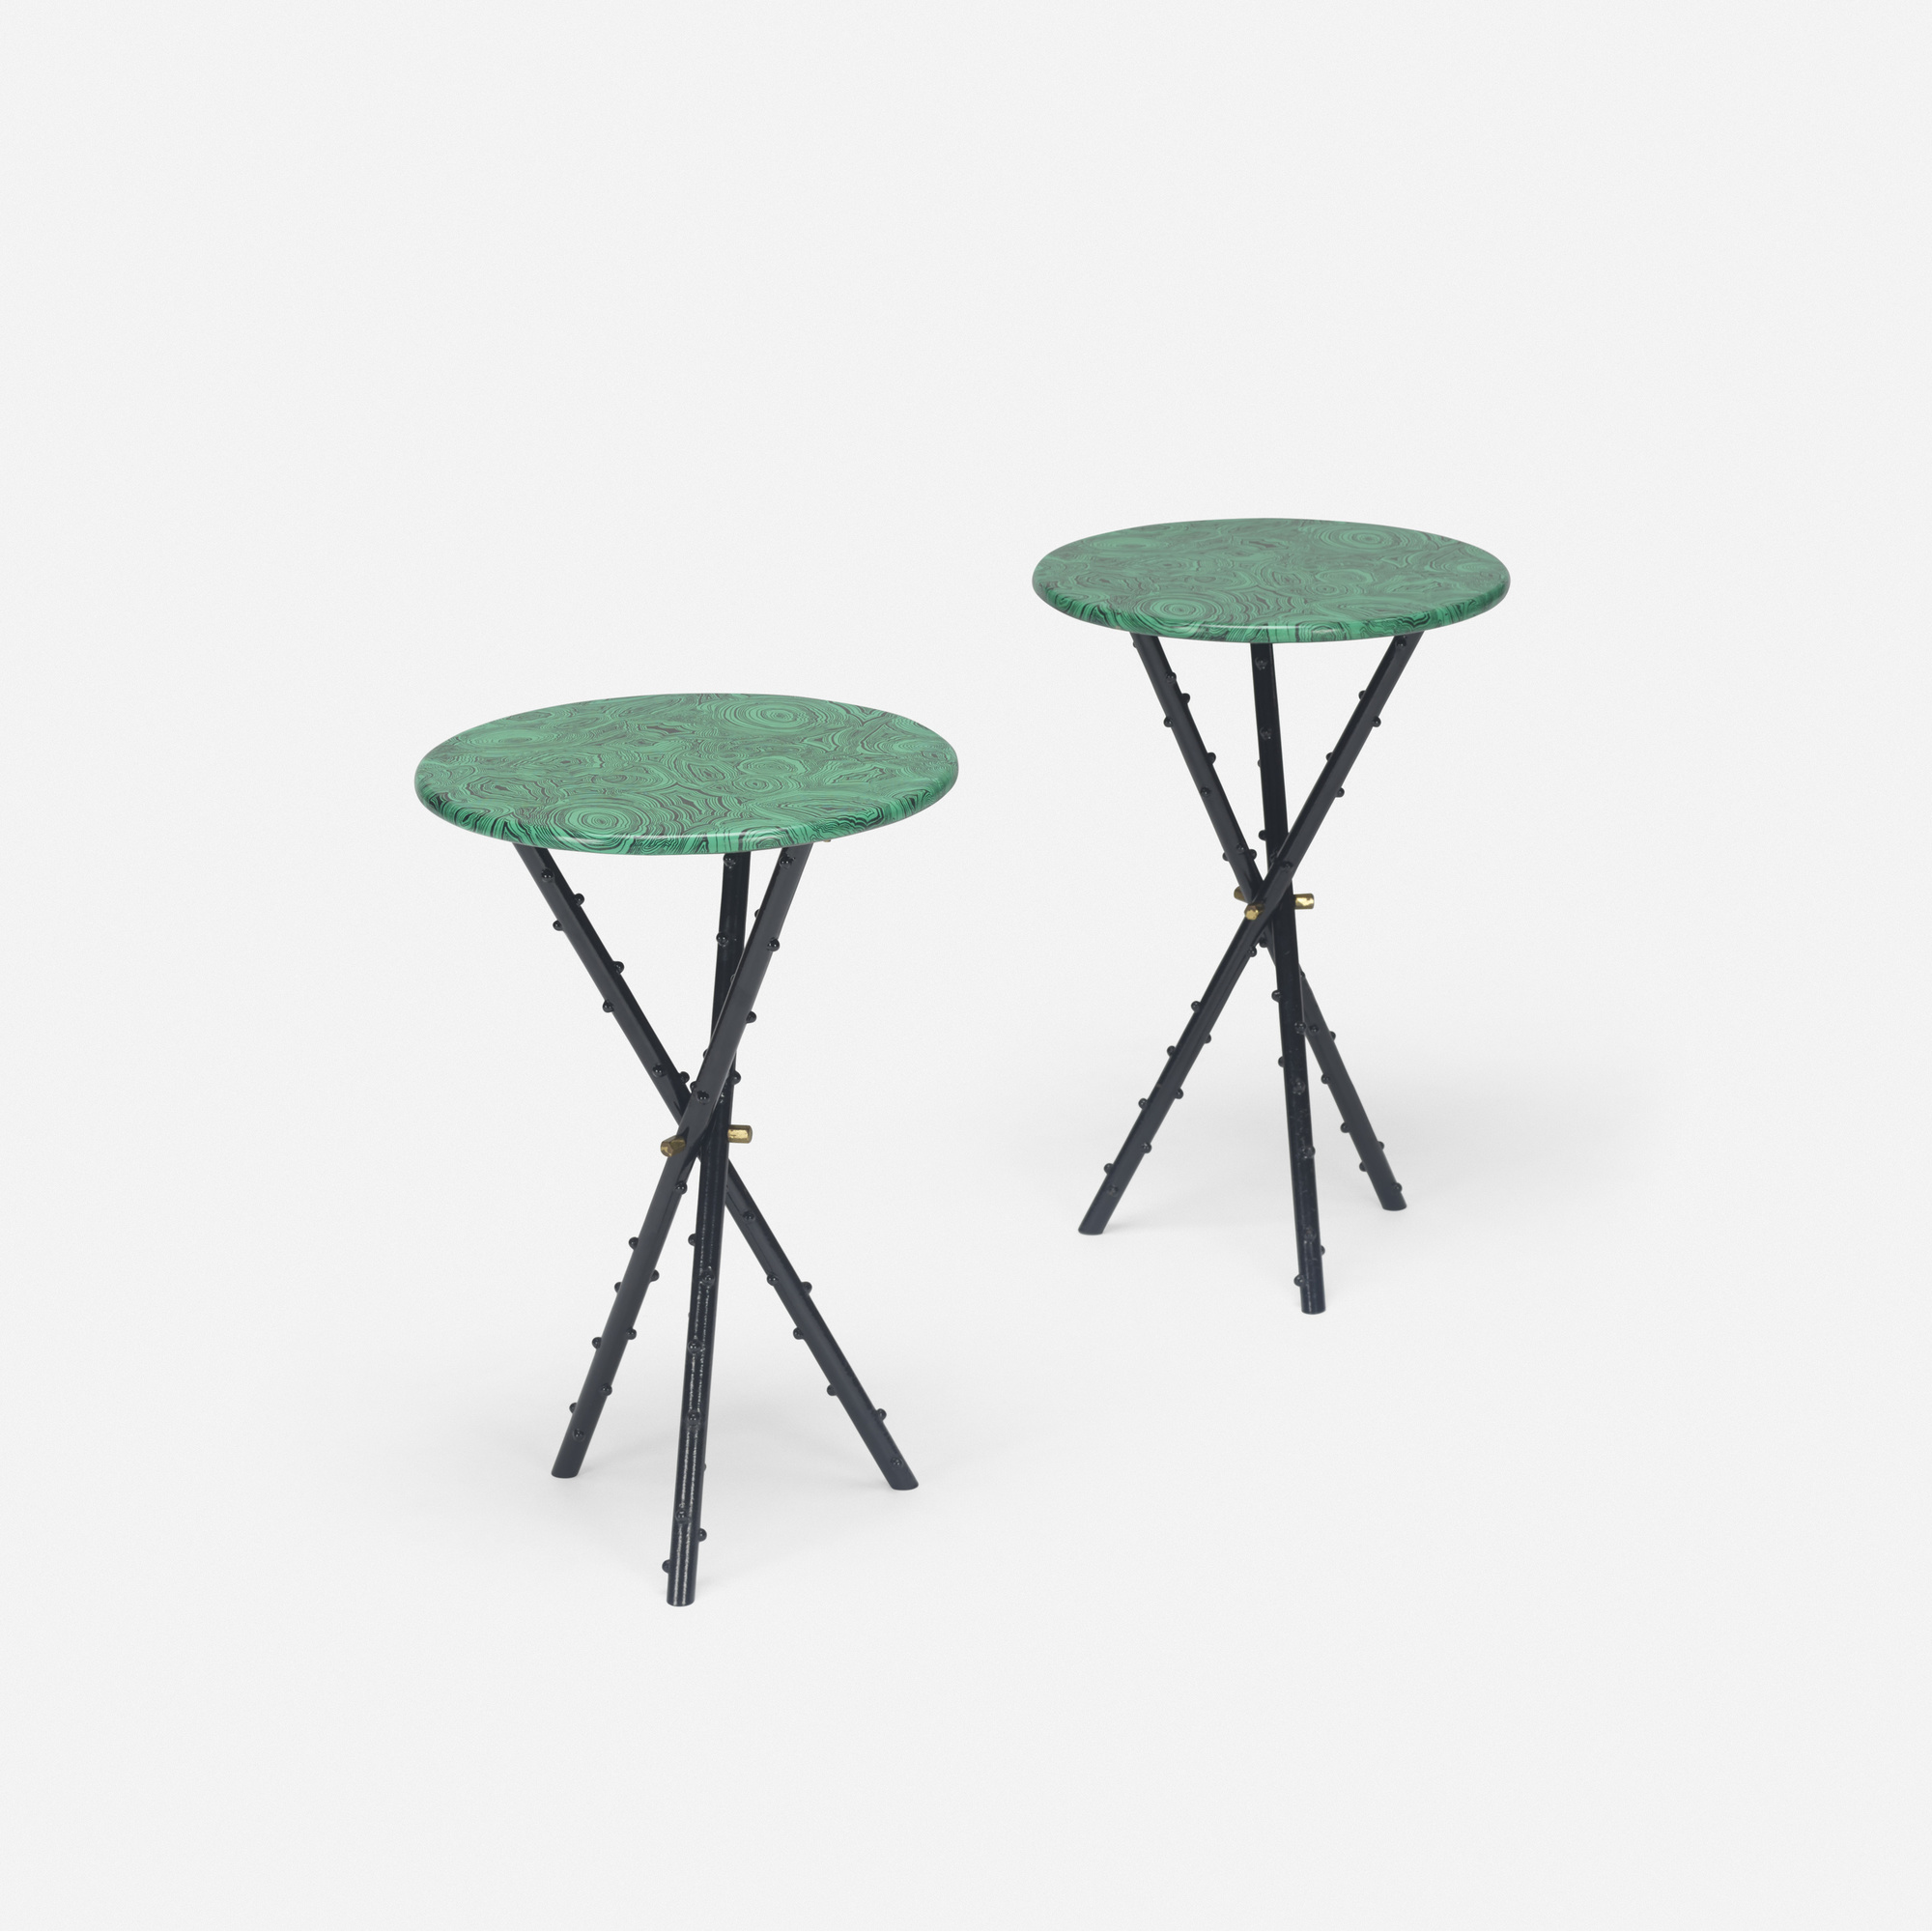 289: Piero Fornasetti / Malachite occasional tables, pair (1 of 3)